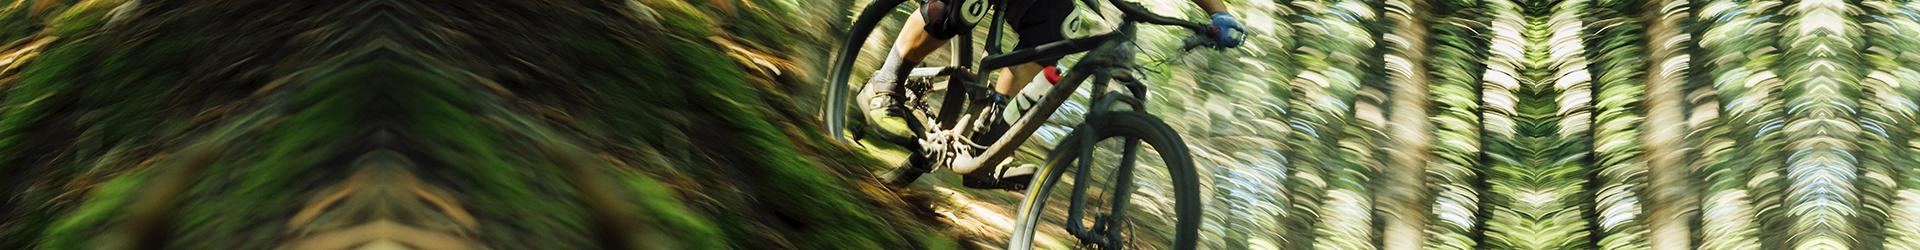 mantencion de bicicleta